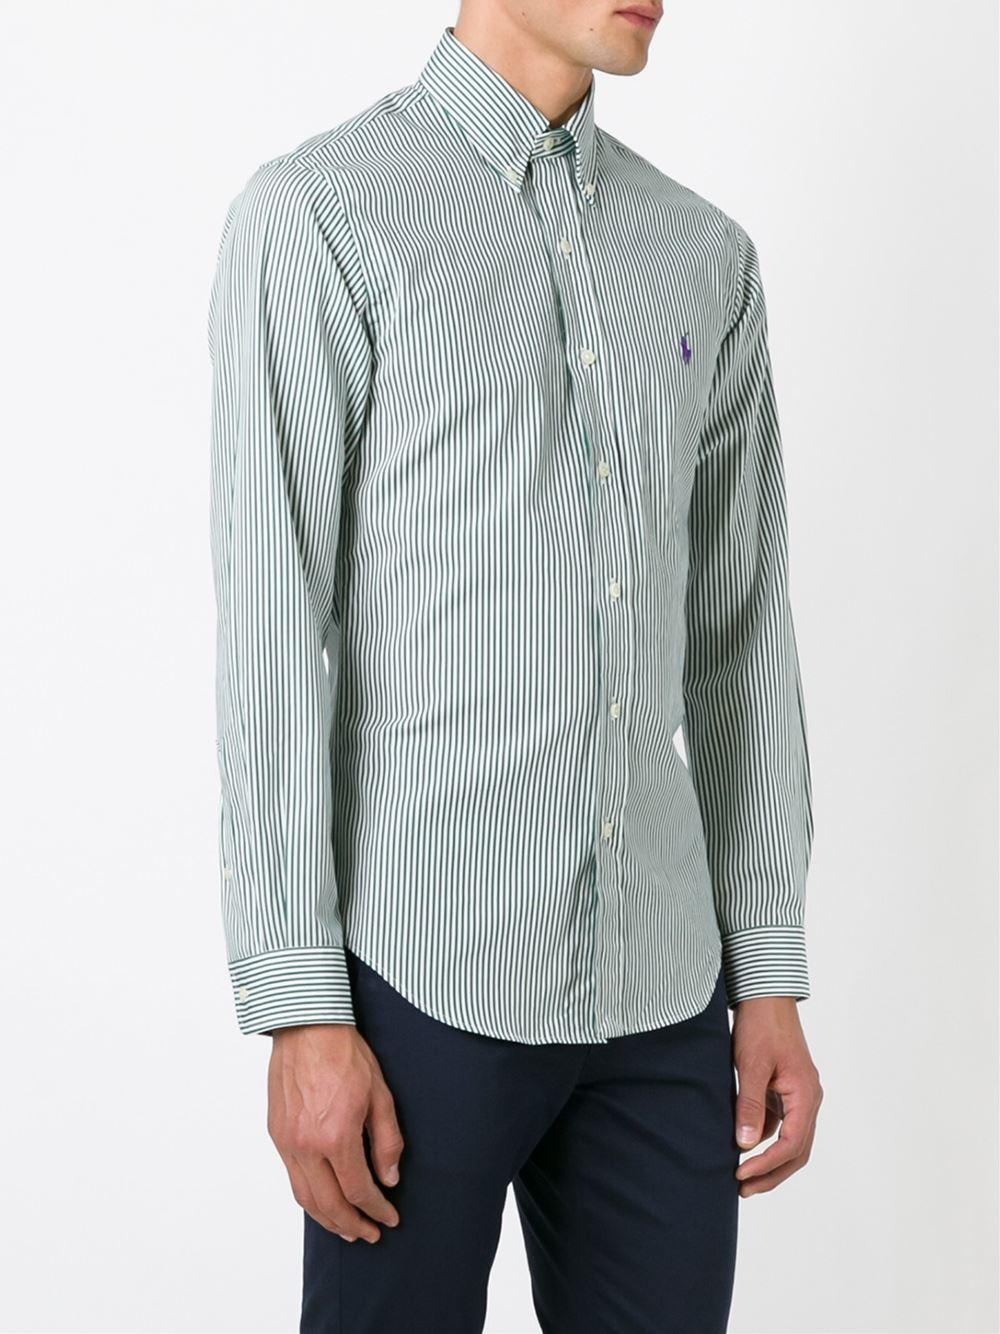 Polo ralph lauren striped button down shirt in green for for Striped button down shirts for men